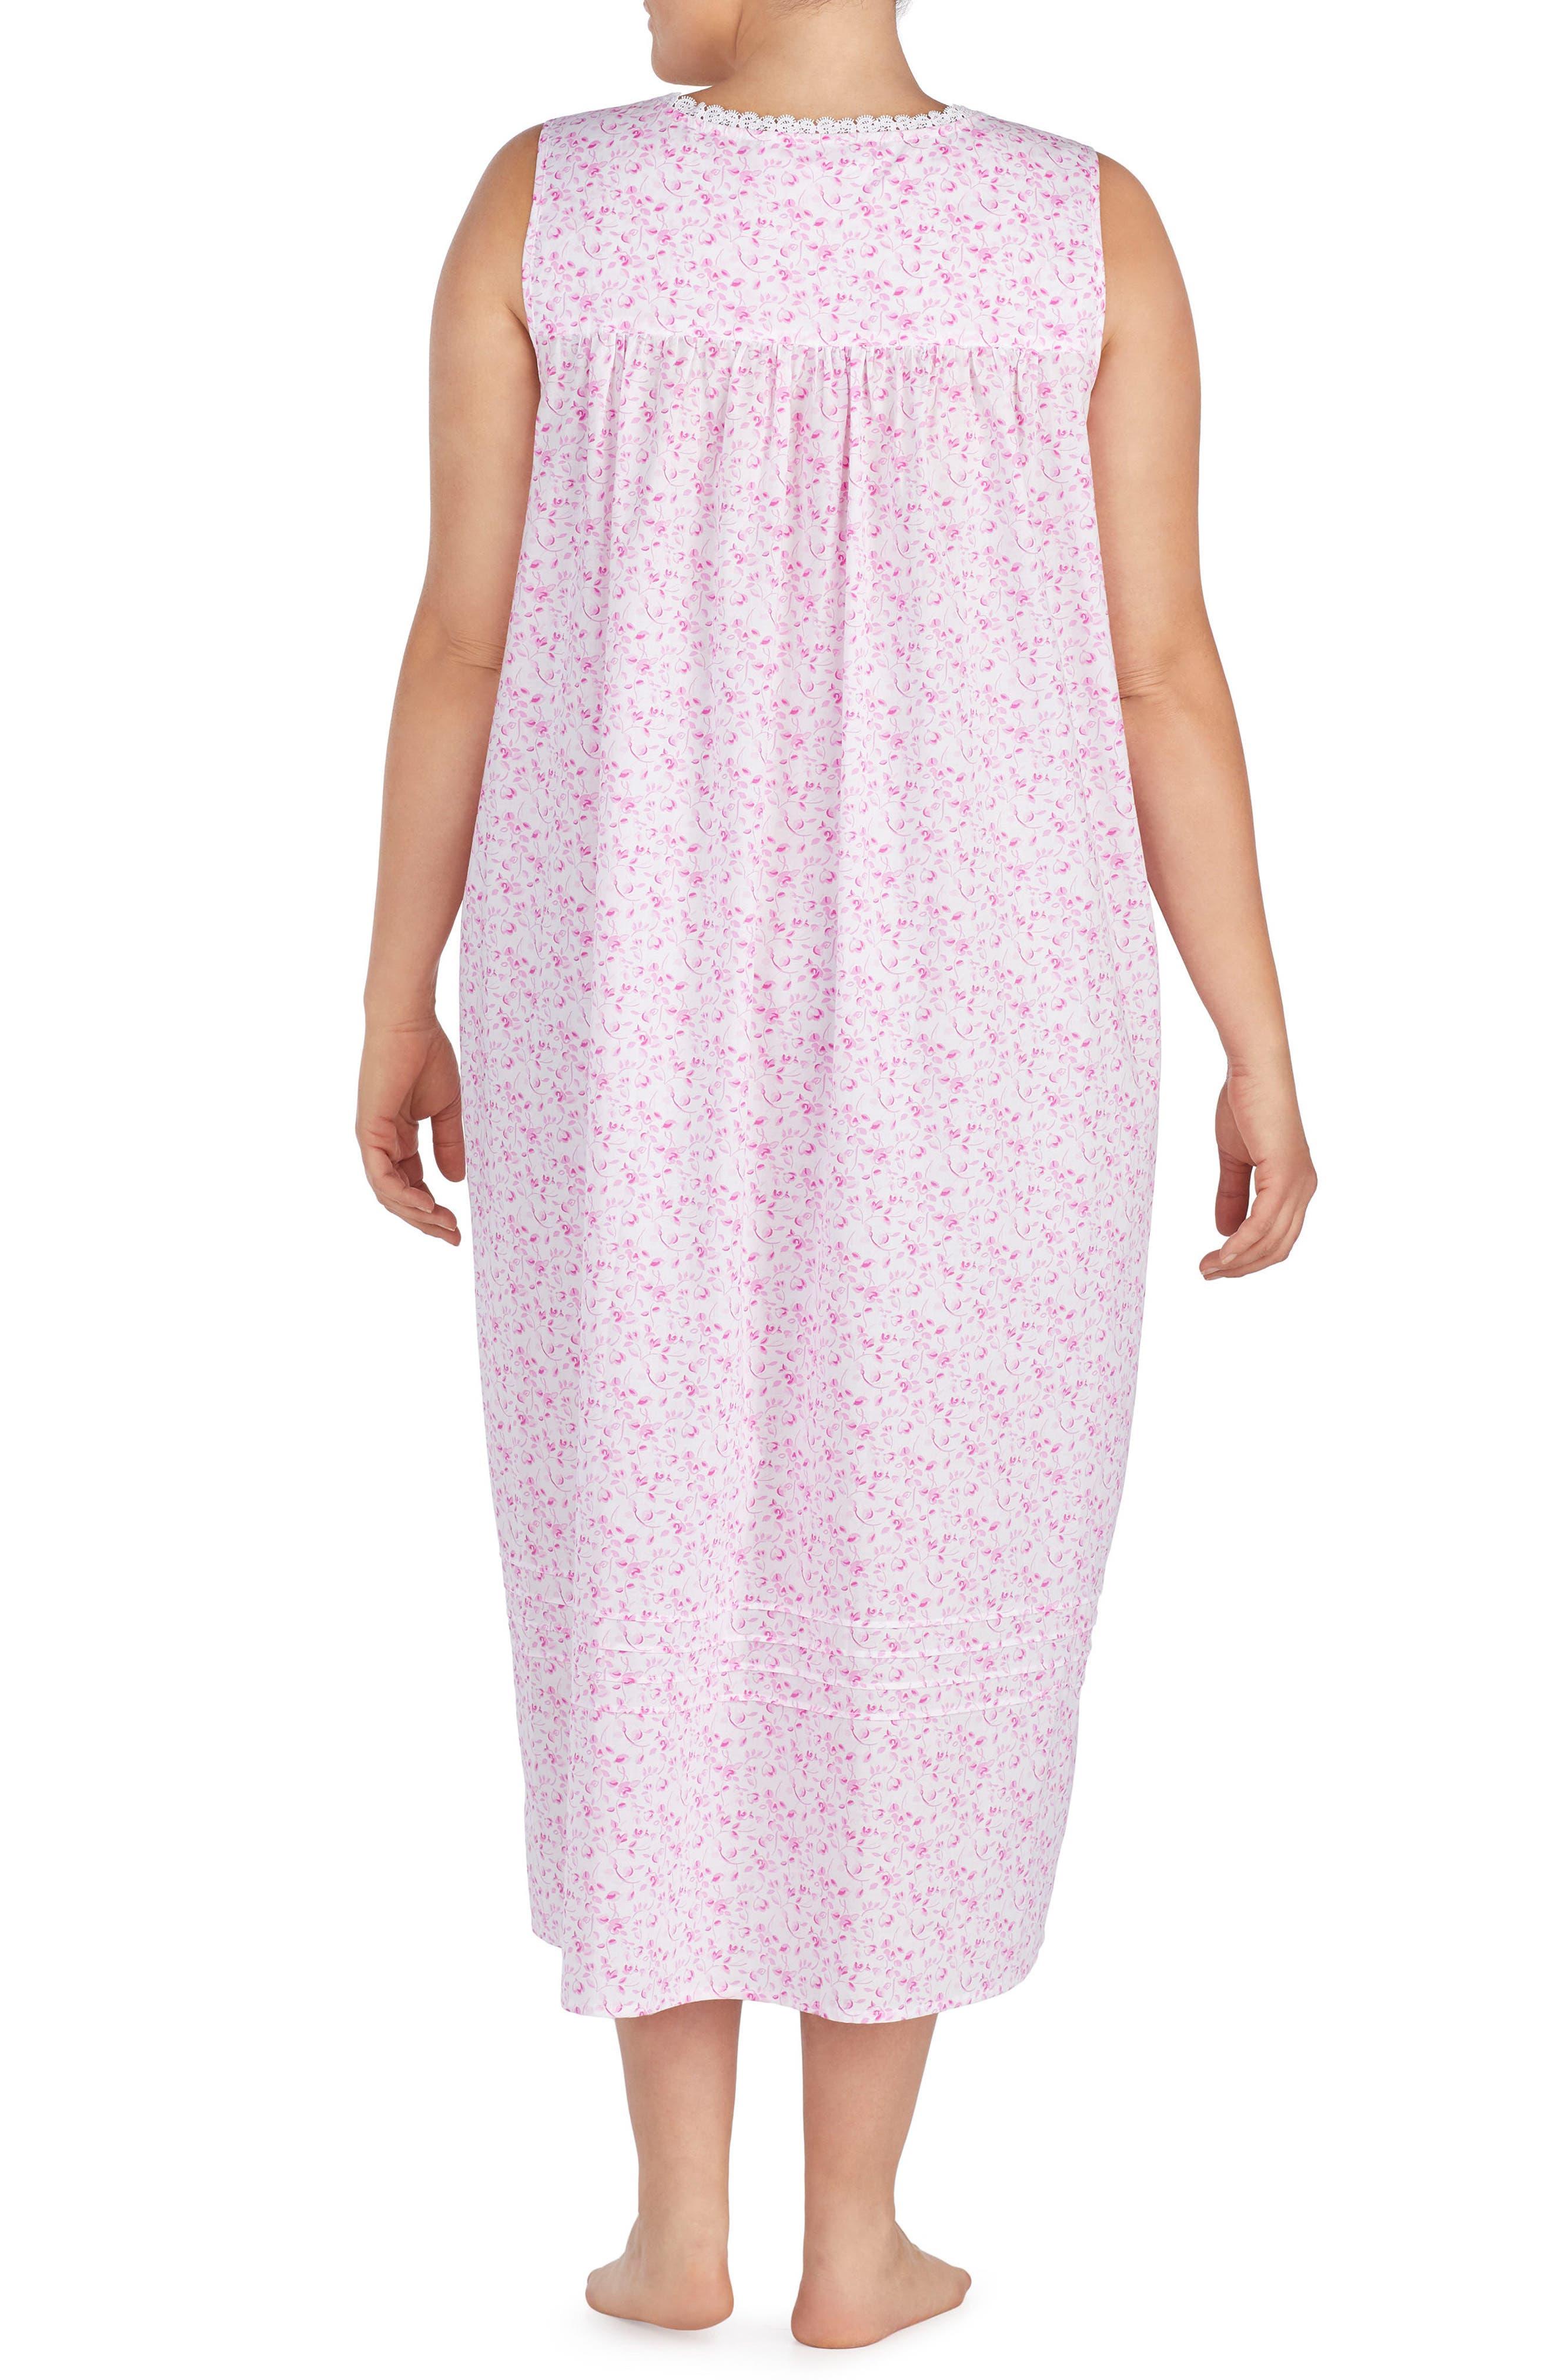 Cotton Lawn Ballet Nightgown,                             Alternate thumbnail 2, color,                             Rose Floral